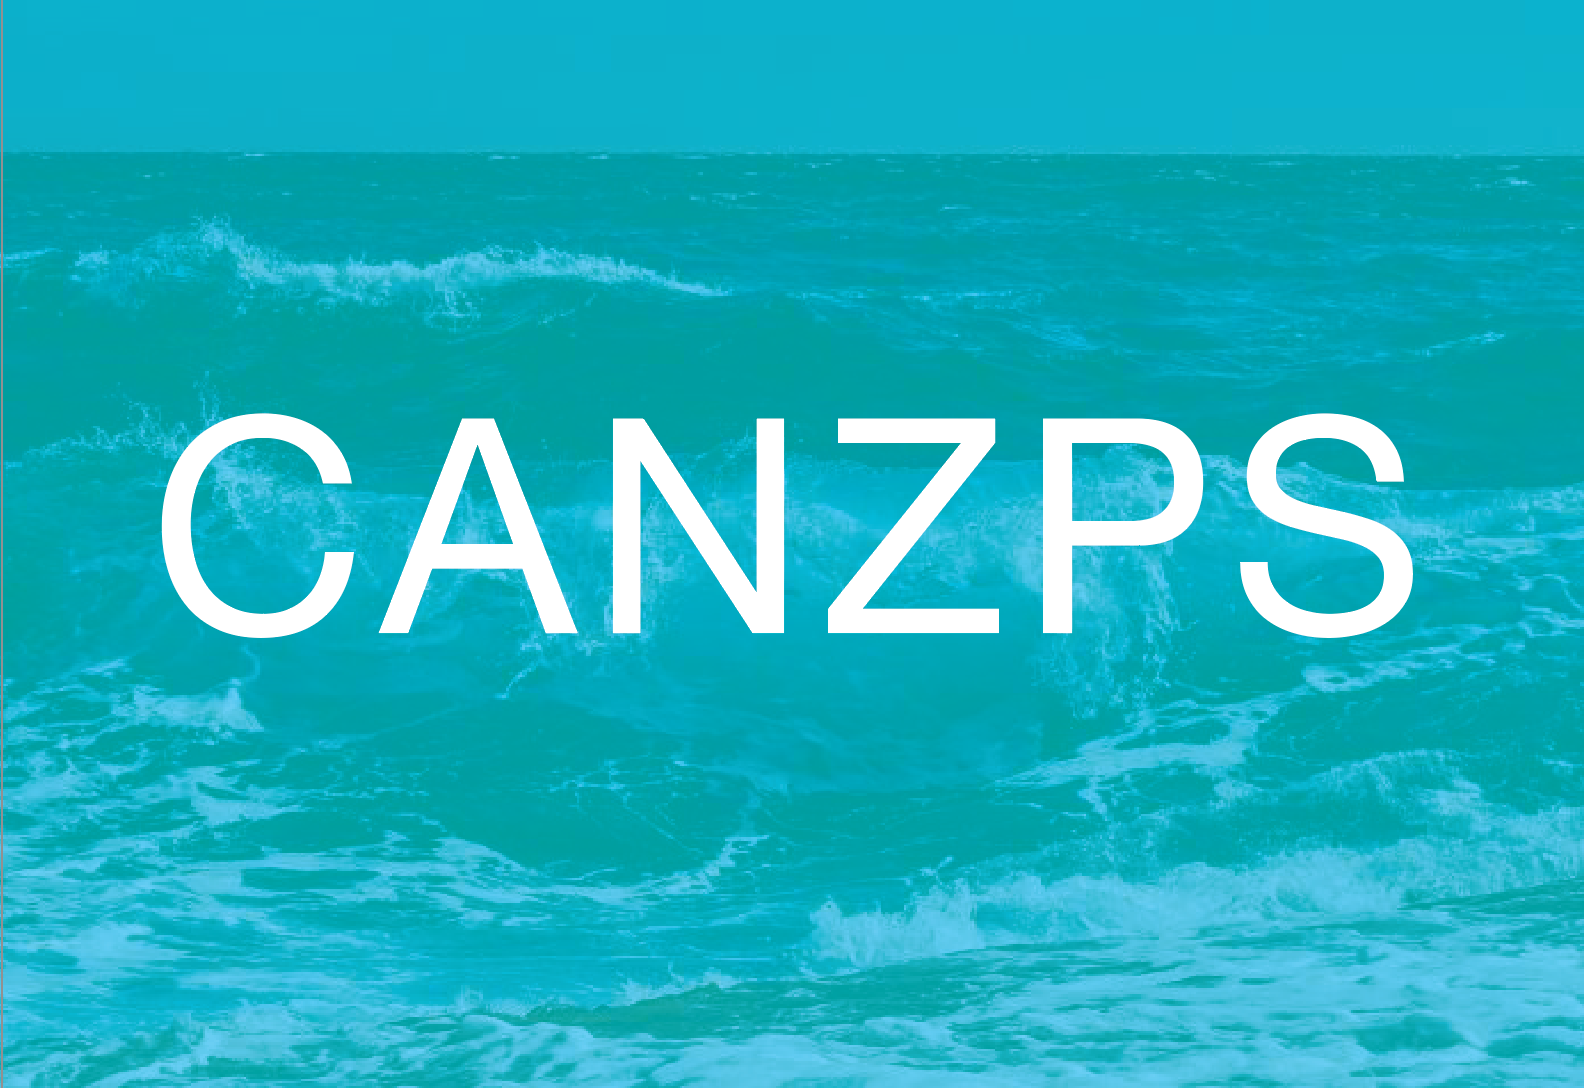 CANZPS acronym